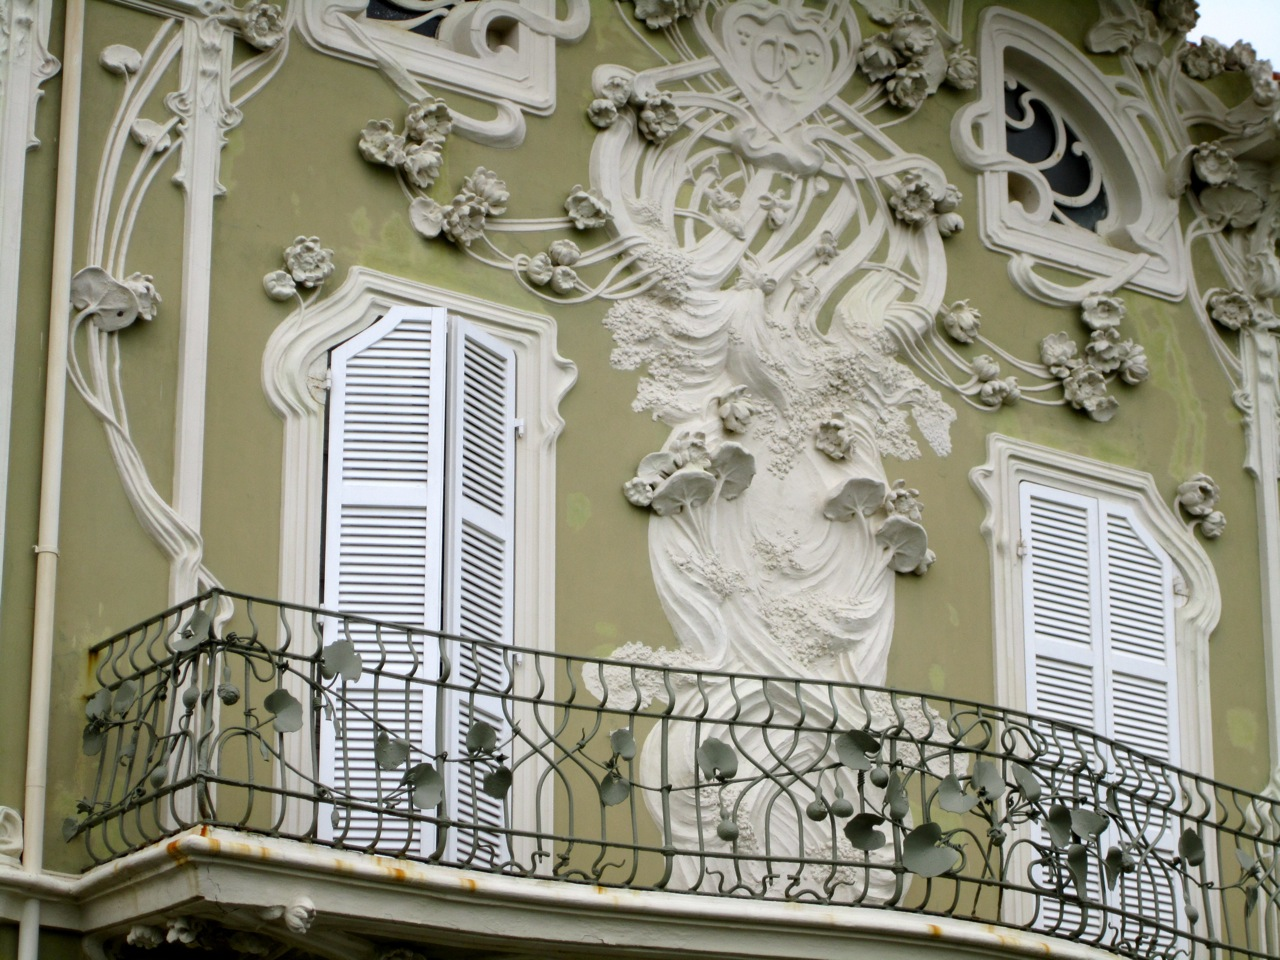 William morris fan club villino ruggeri a most for Revue art et decoration